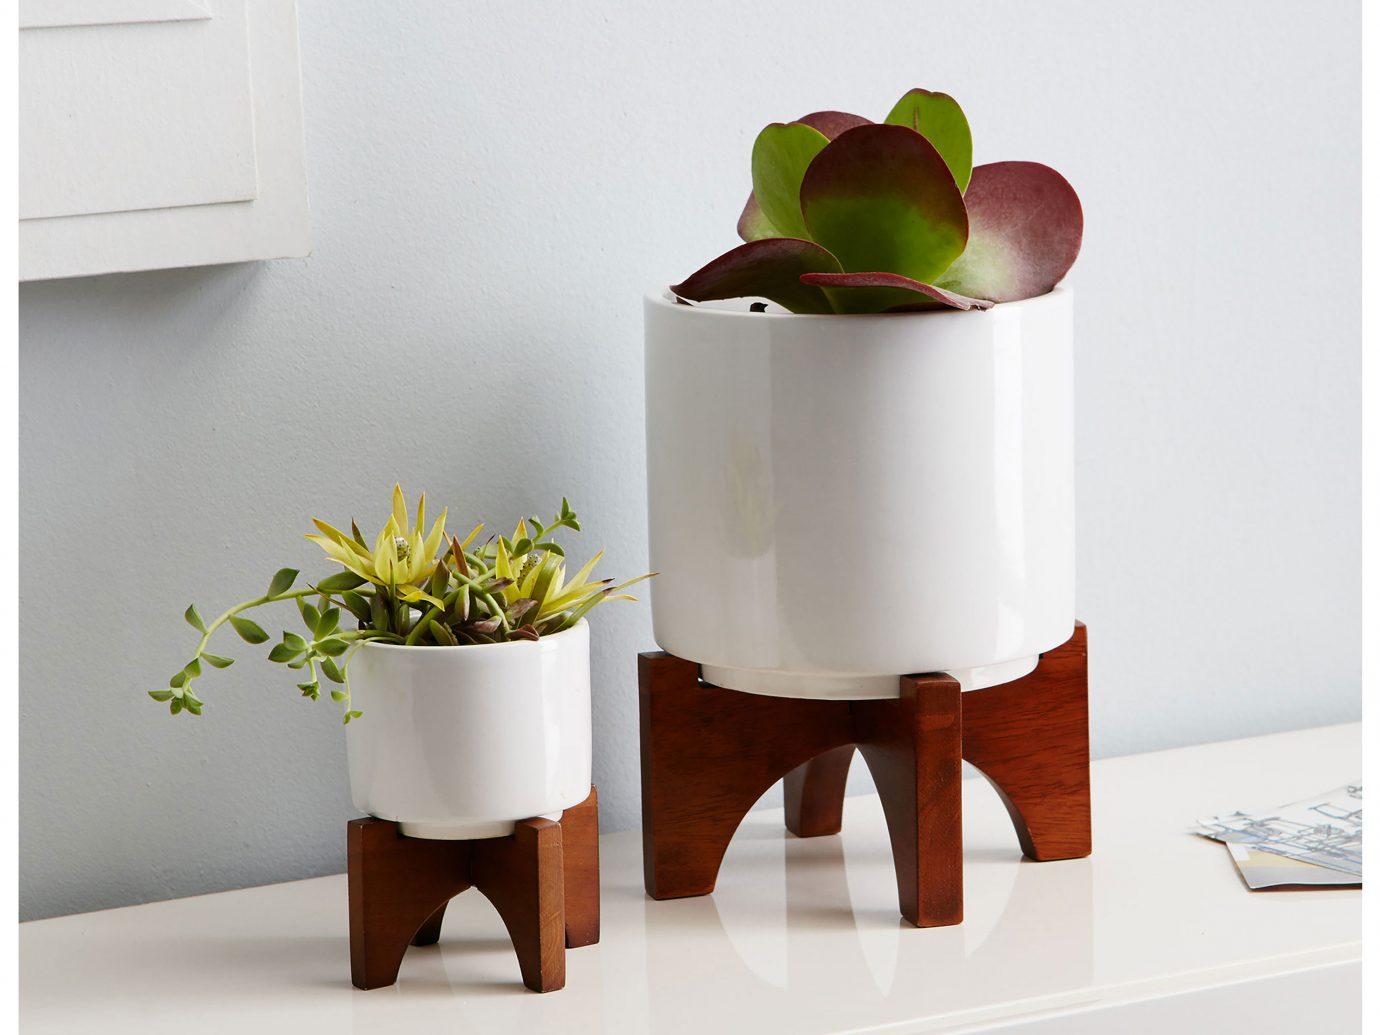 Style + Design indoor furniture product shelf ceramic table lighting vase flowerpot produce food